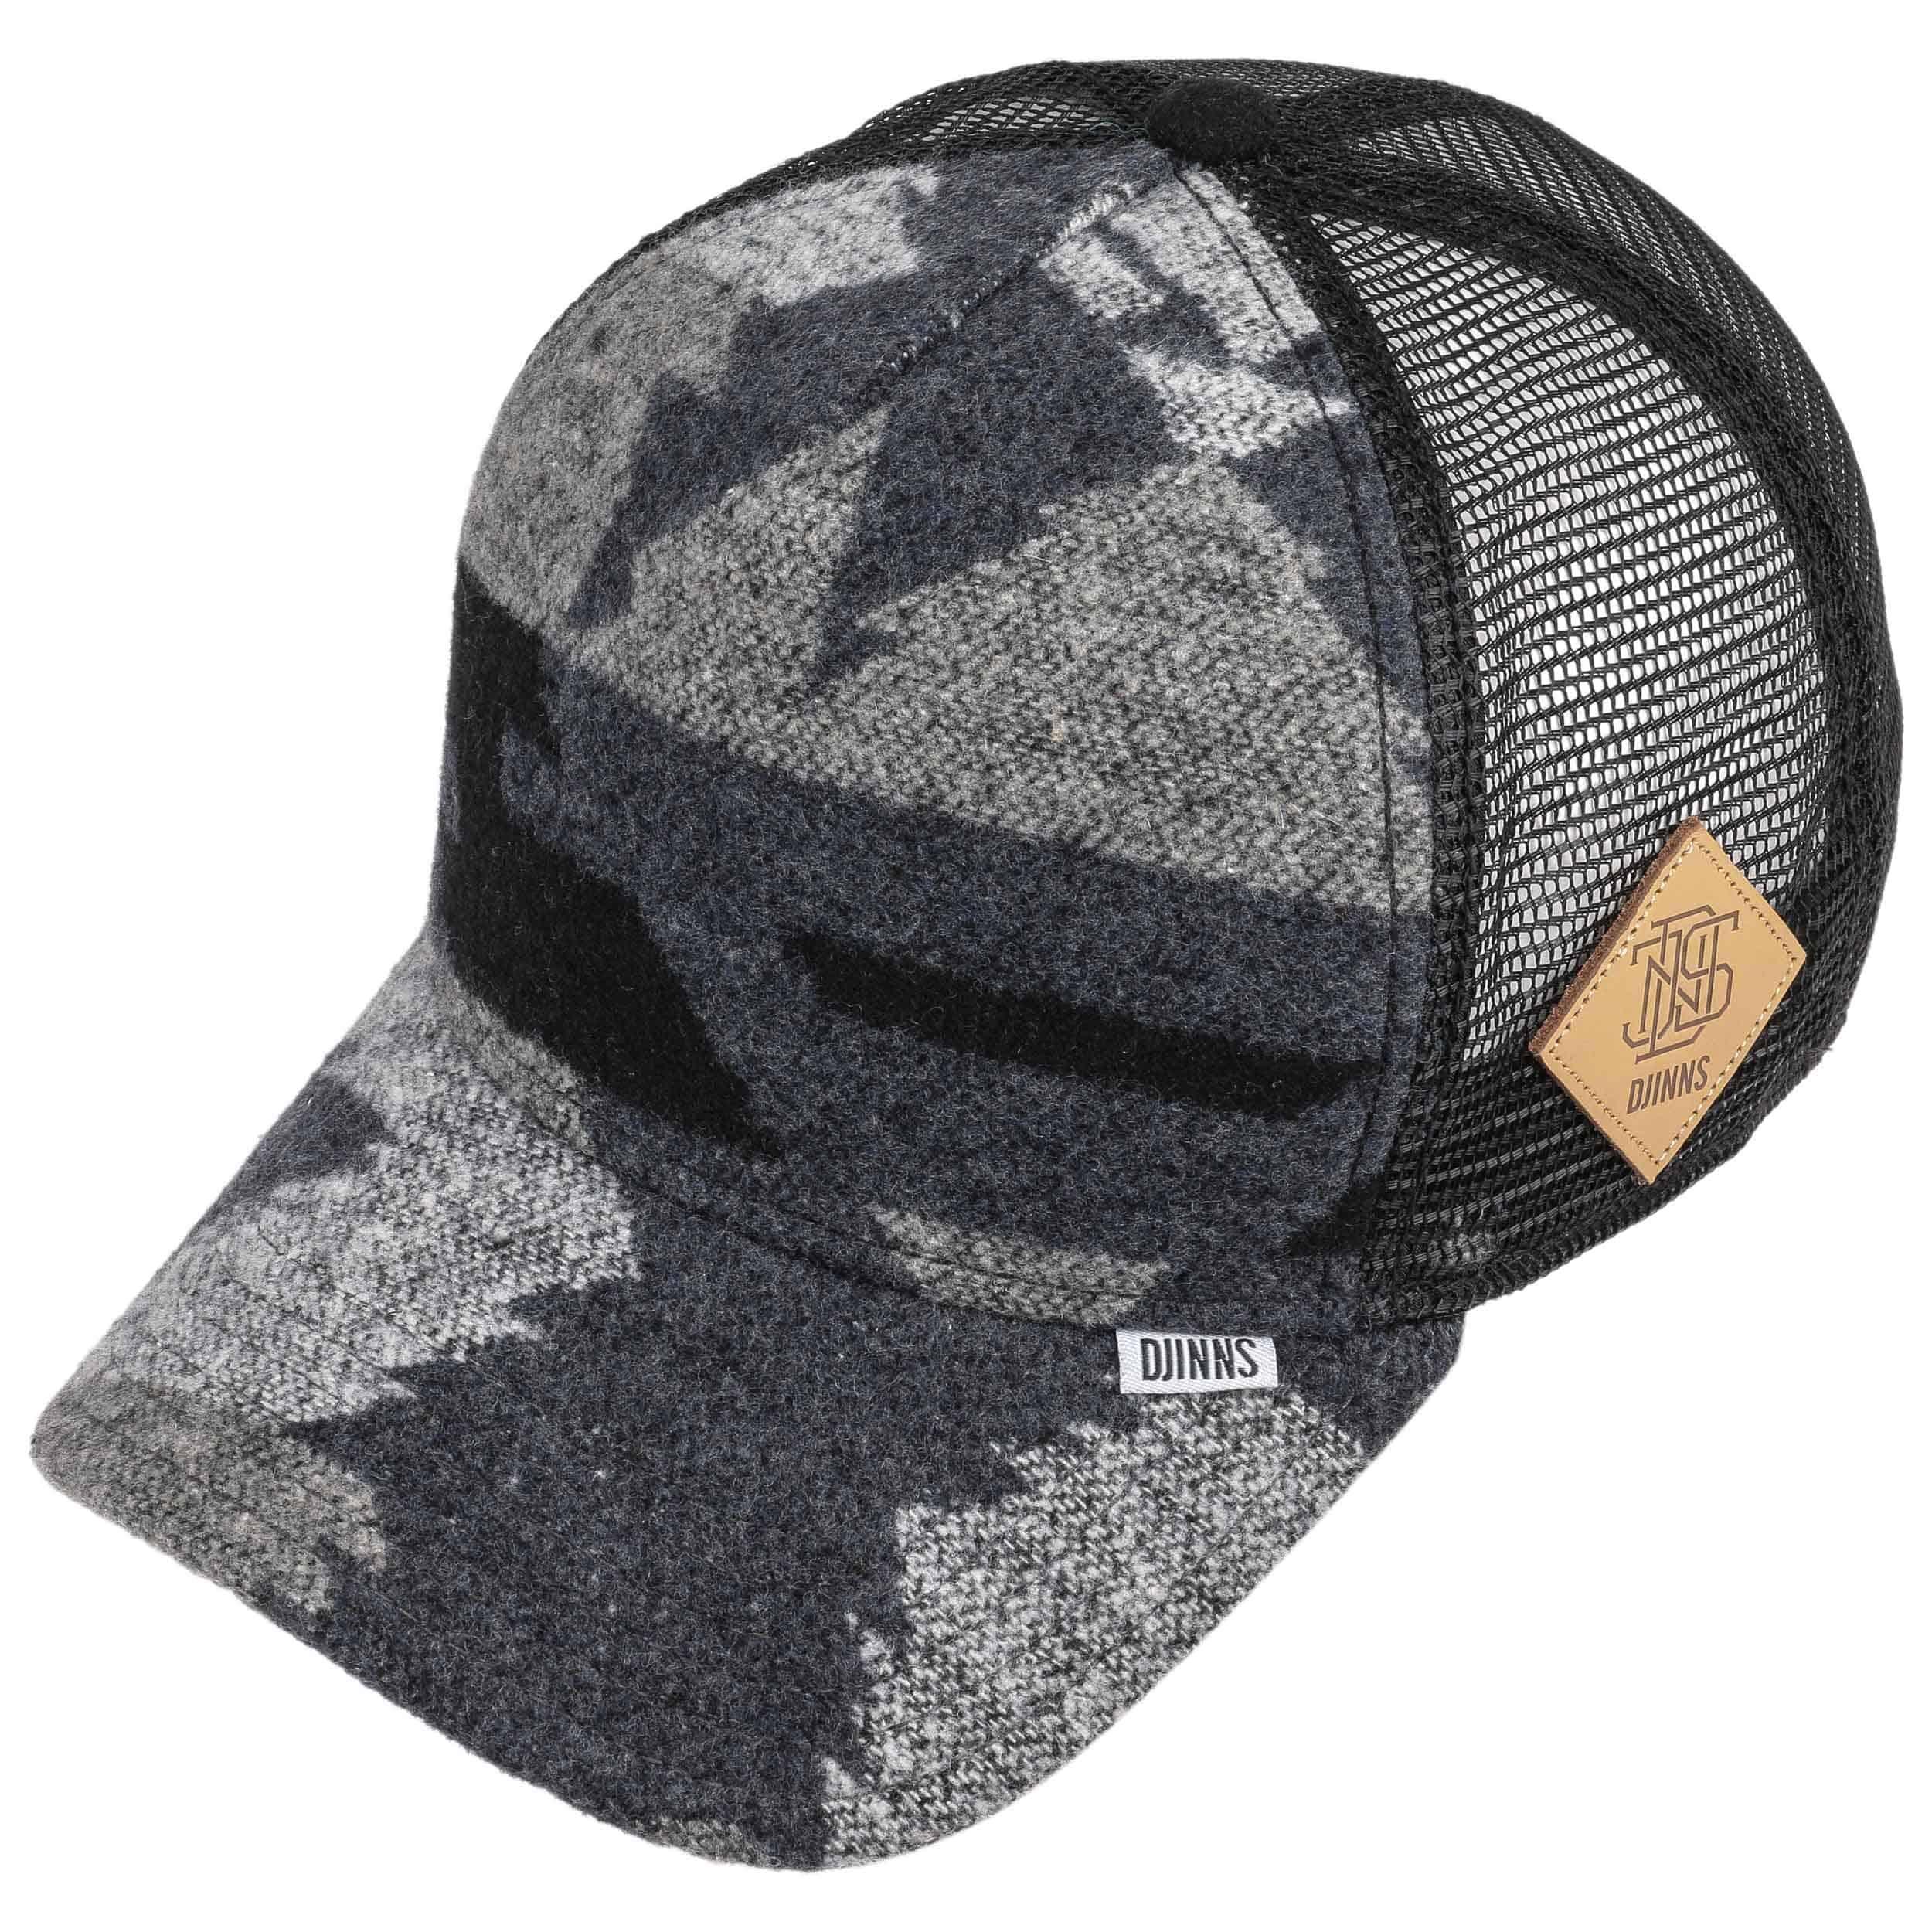 wool aztek hft trucker cap by djinns eur 24 99 hats. Black Bedroom Furniture Sets. Home Design Ideas